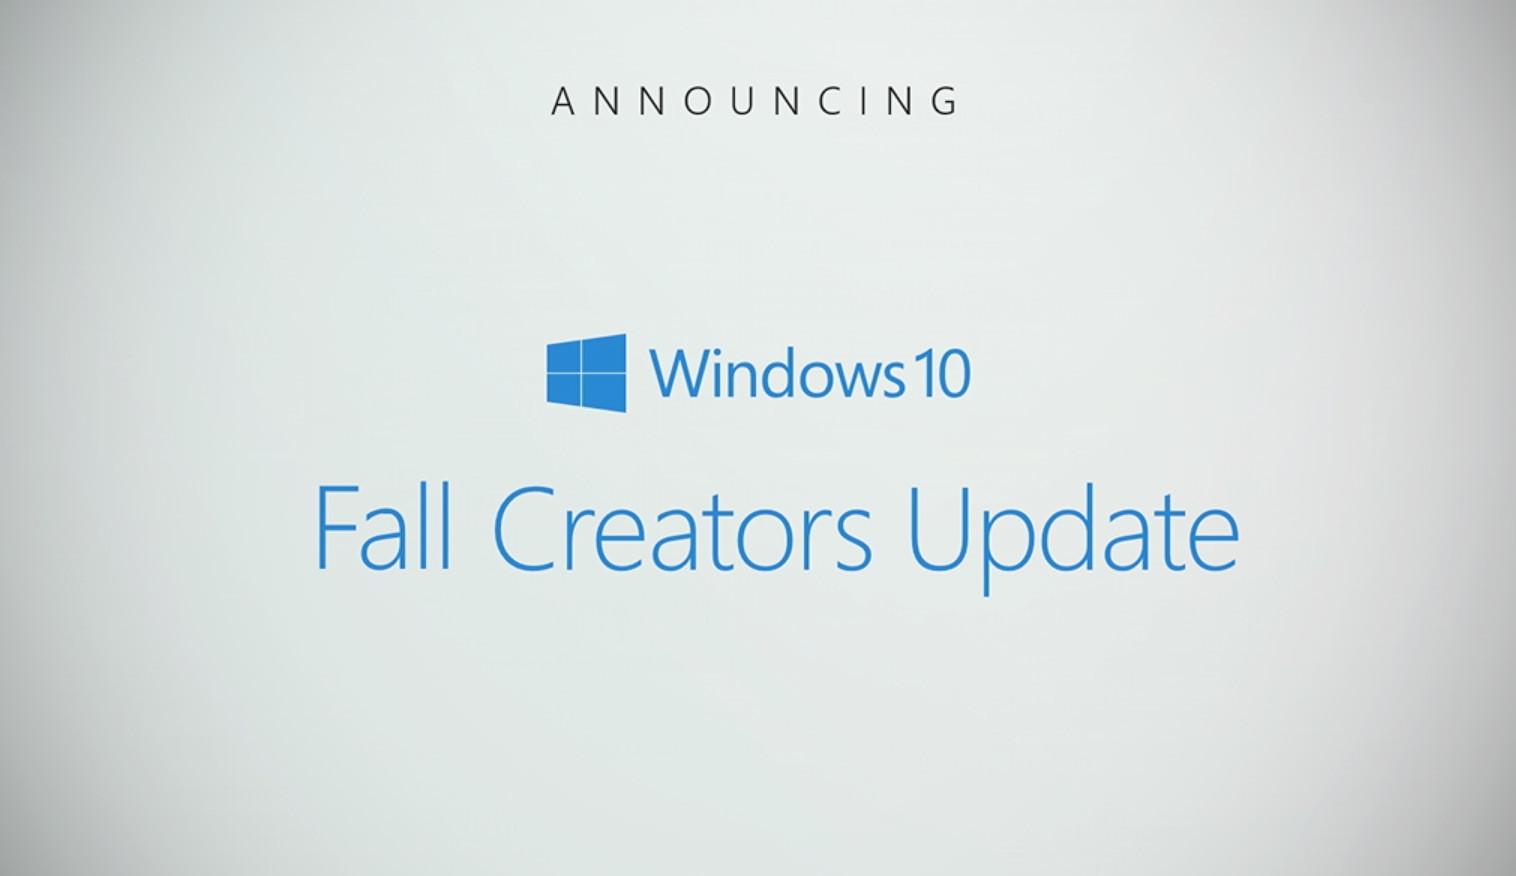 AMD Releases Crimson ReLive Beta Driver for Windows 10 Fall Creators